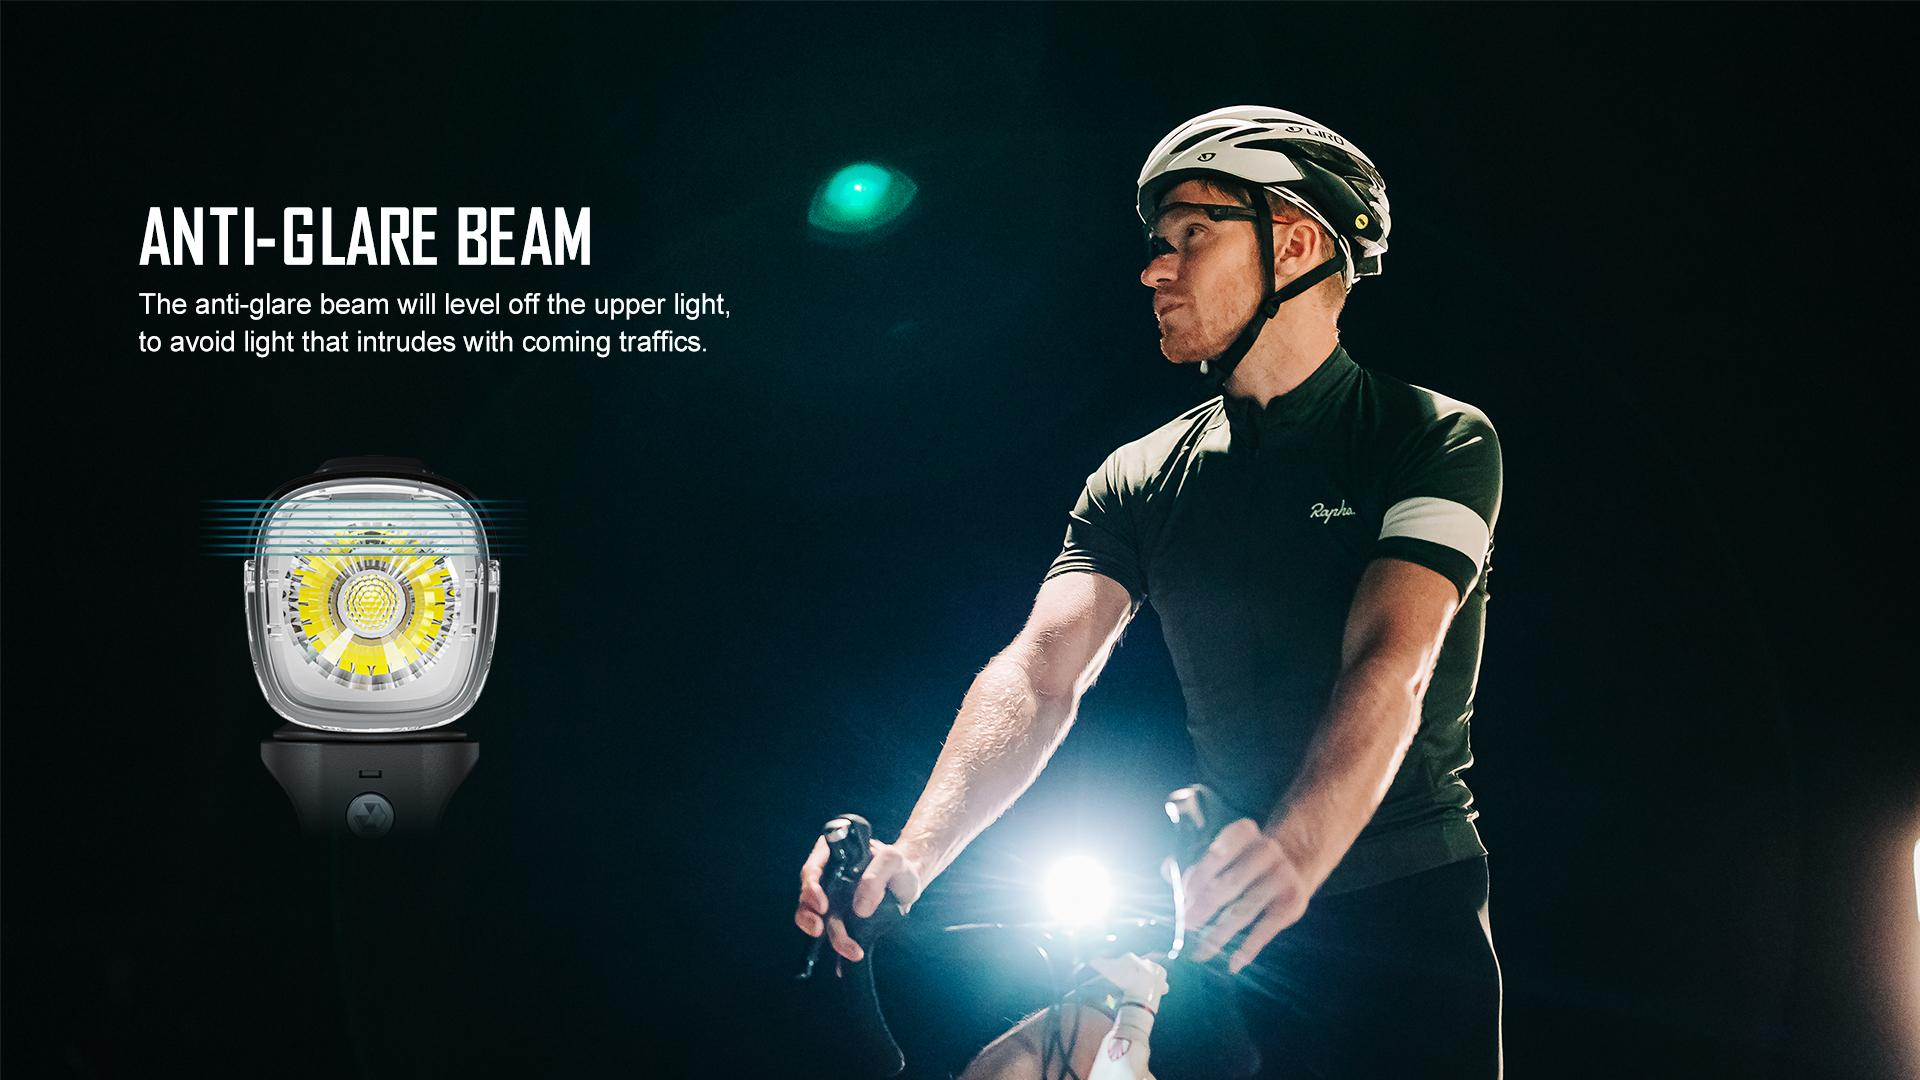 RN 1200 Anti-glare Beam Cycling Light